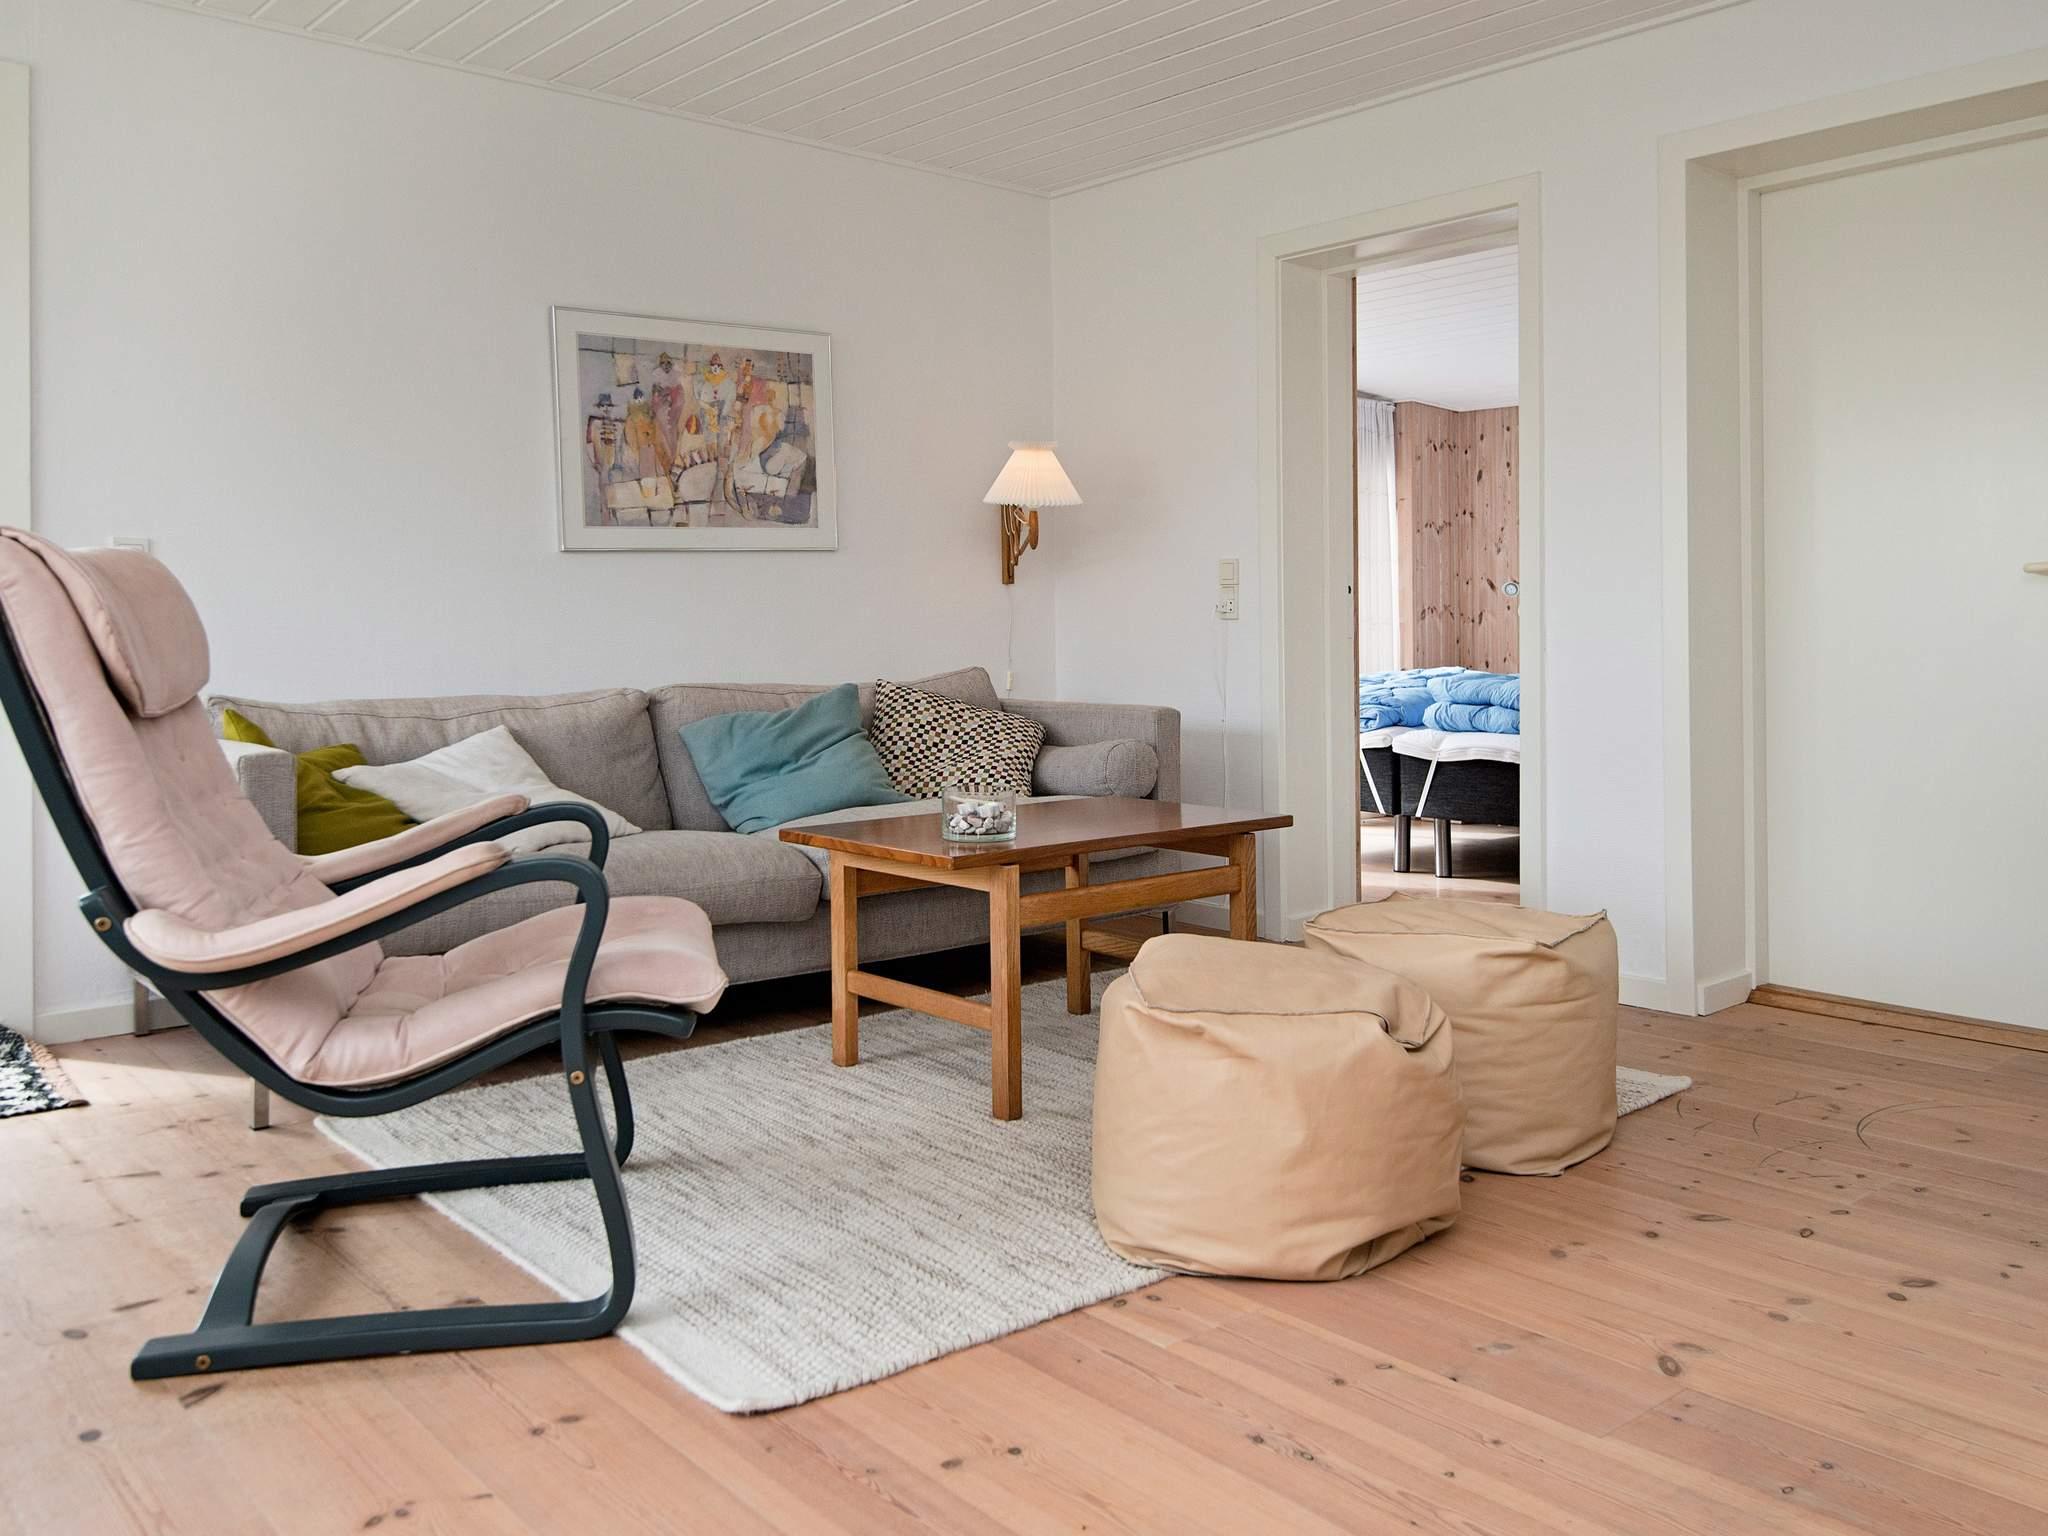 Ferienhaus Ajstrup Strand/Malling (2355032), Ajstrup, , Dänische Ostsee, Dänemark, Bild 5